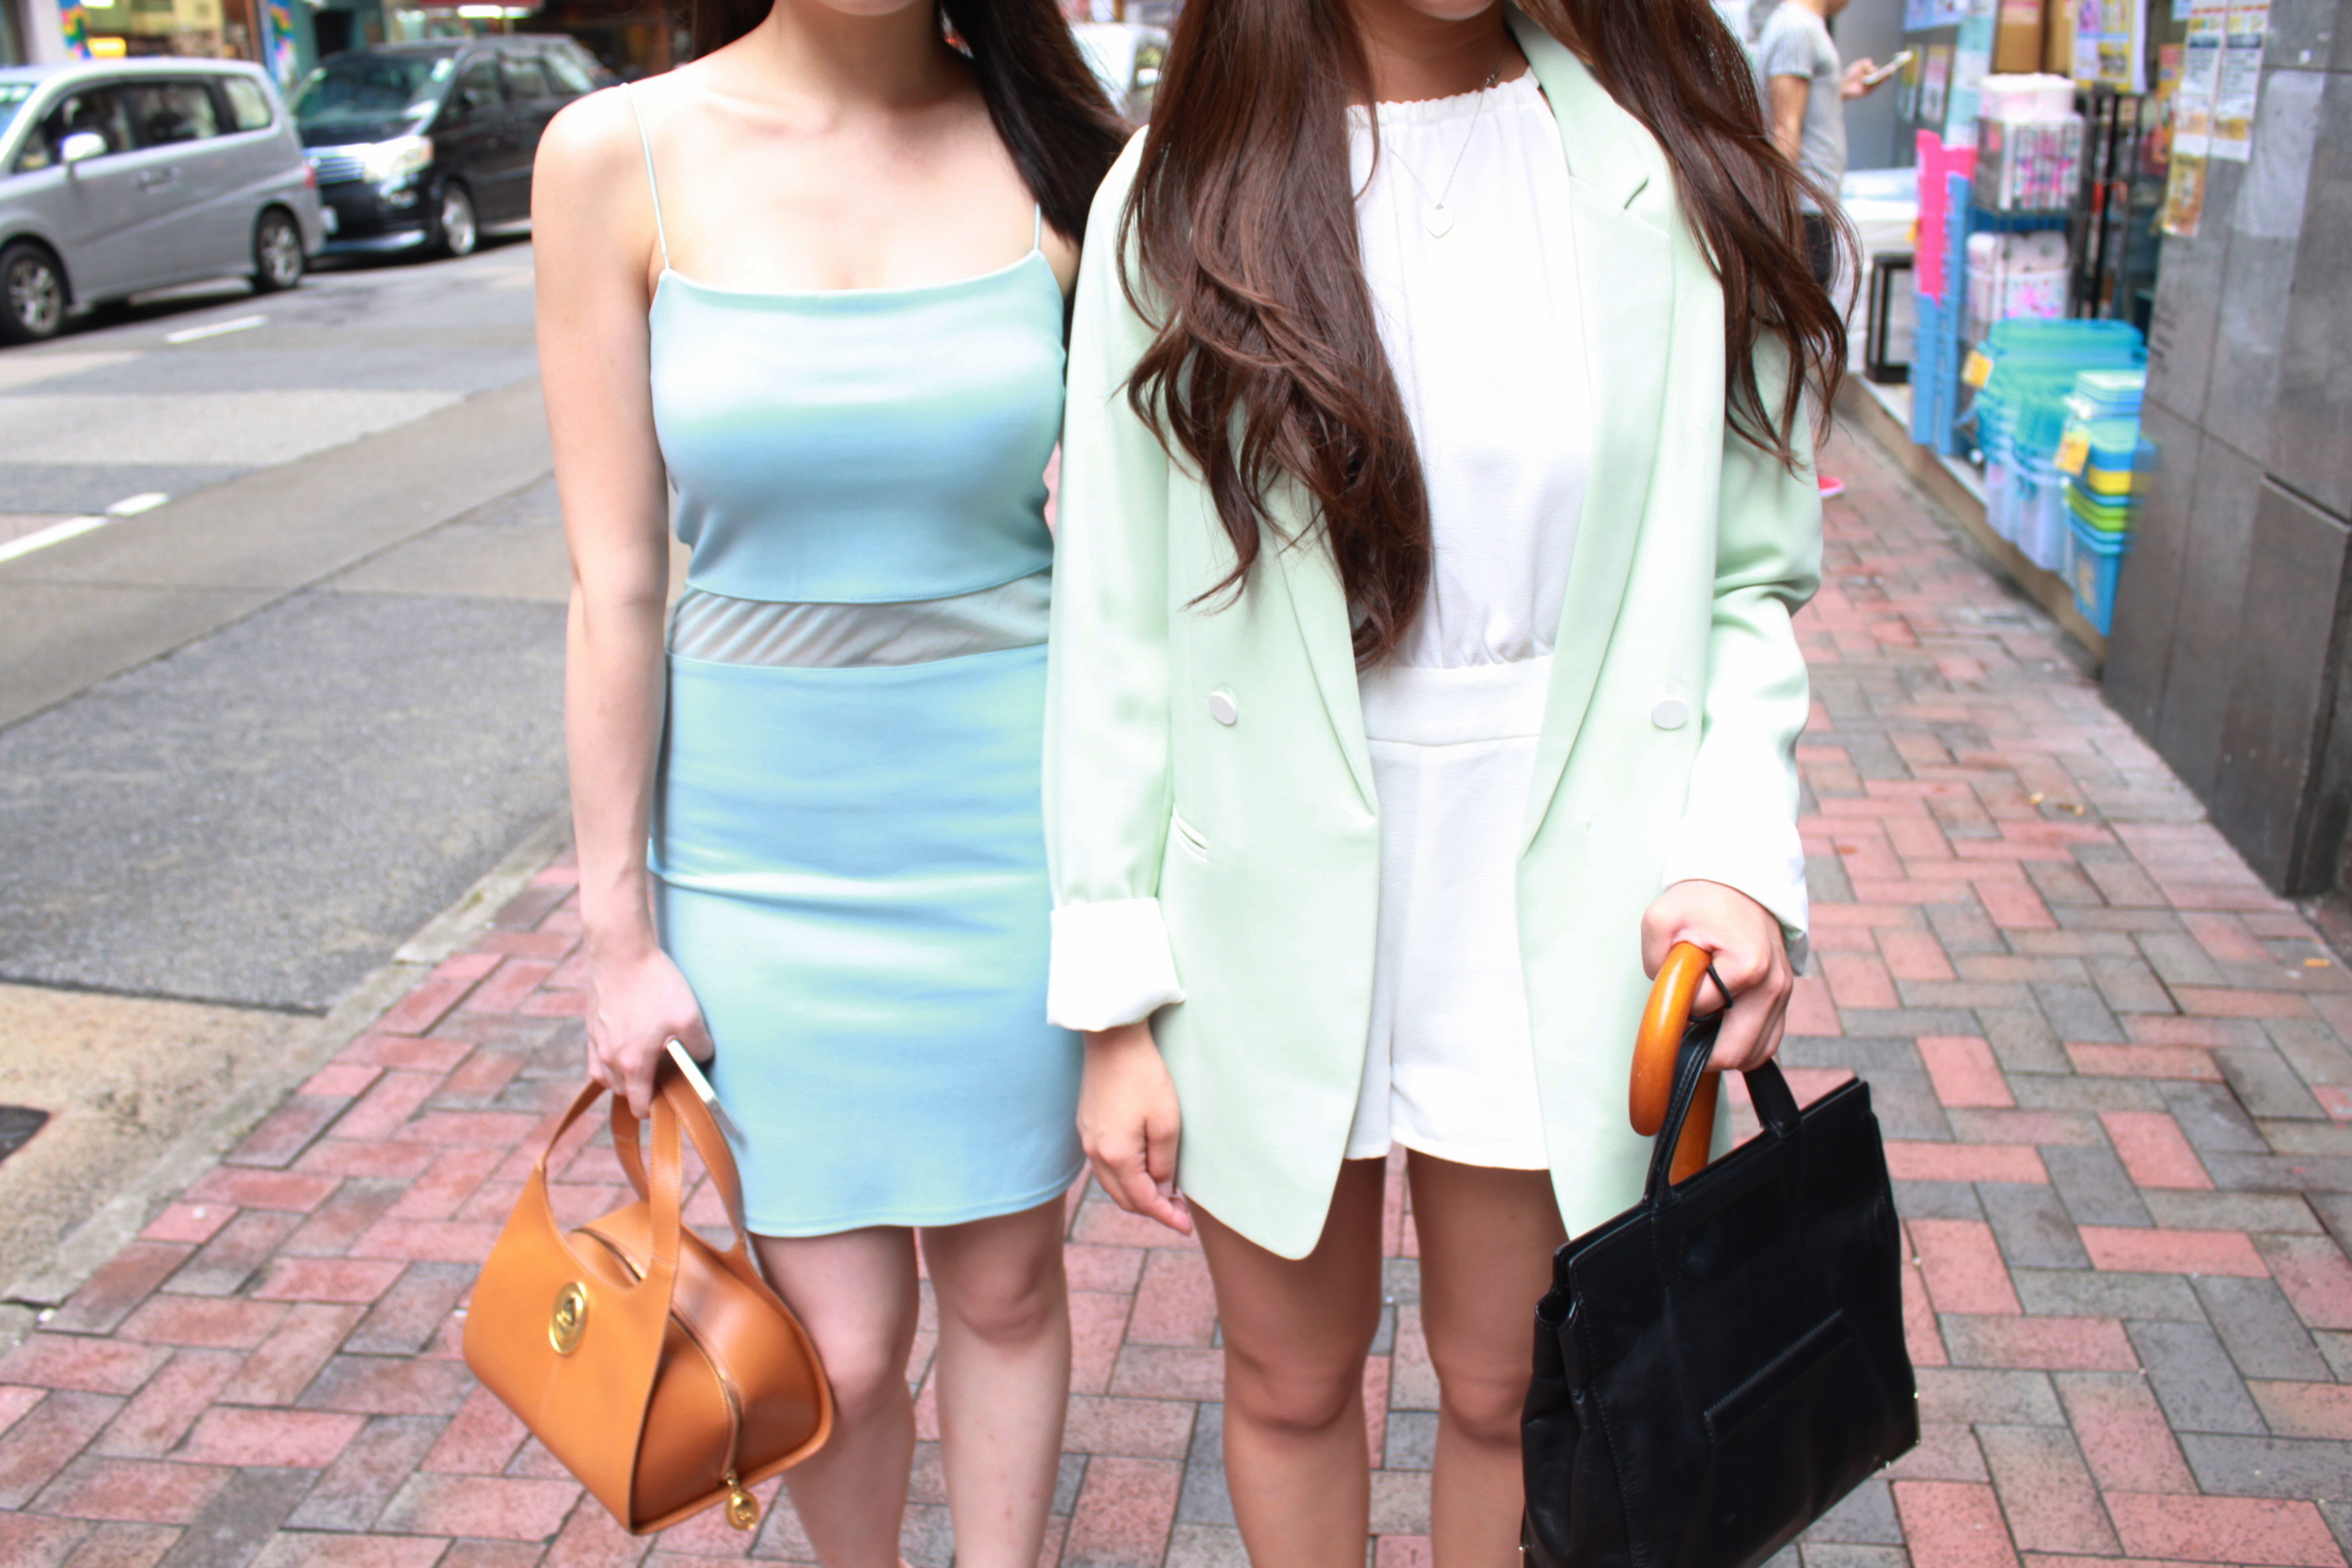 On JS (left): Missguided baby blue dress / Christian Dior handbag / Office grey mules On me (right): Mint green long blazer / White halter neck playsuit / Alexander Wang handbag / White loafers